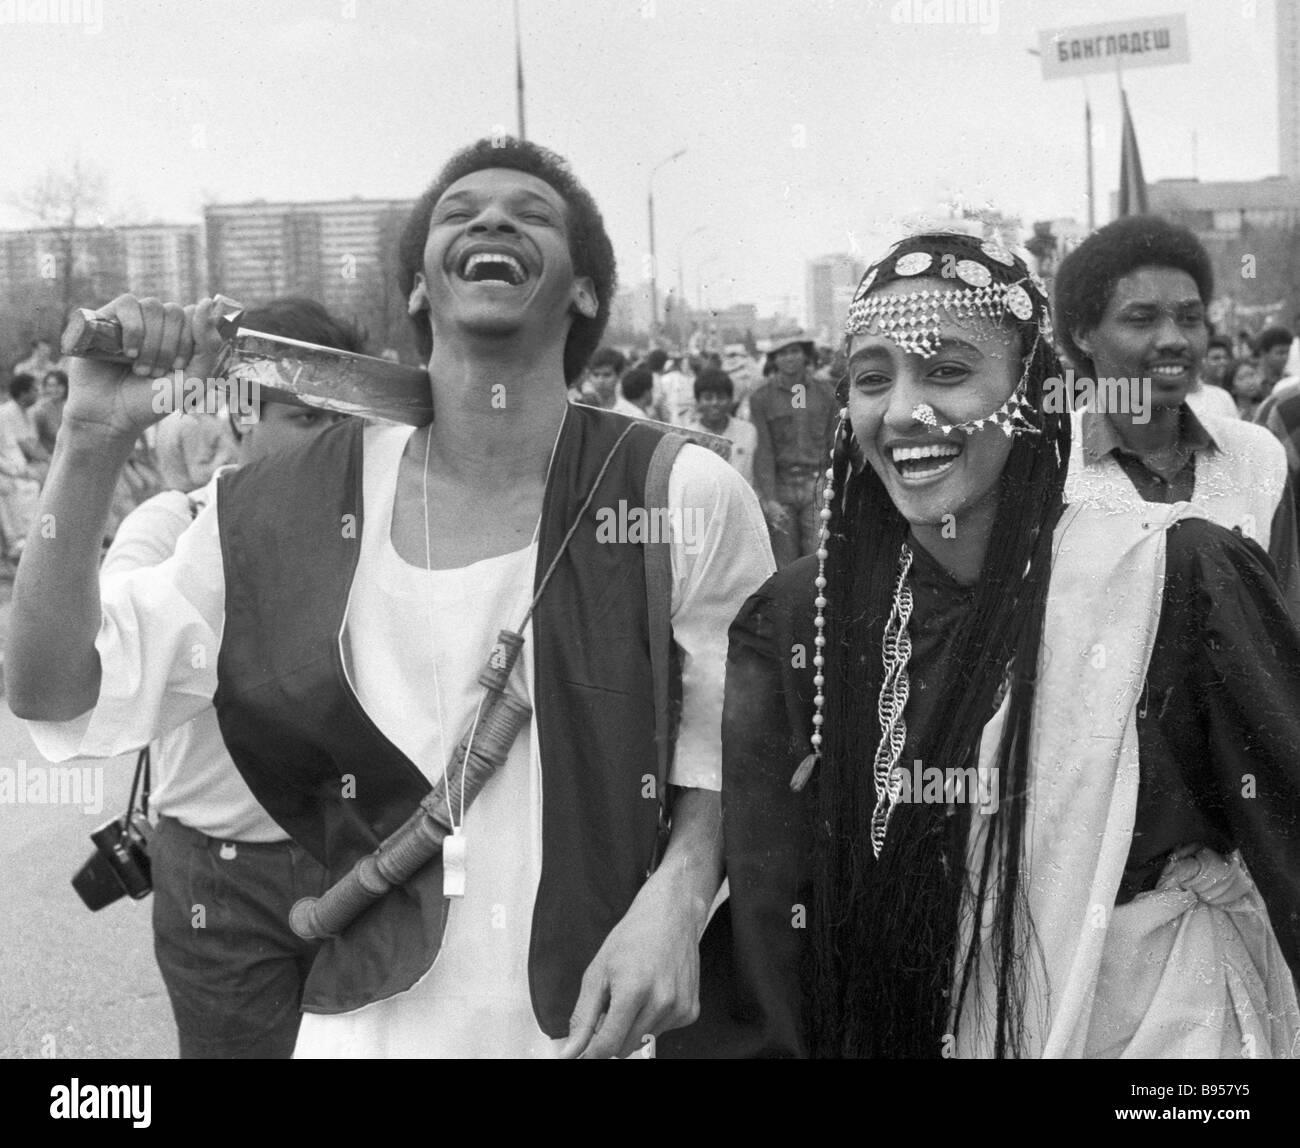 Los participantes de un festival folclórico estudiantil Imagen De Stock